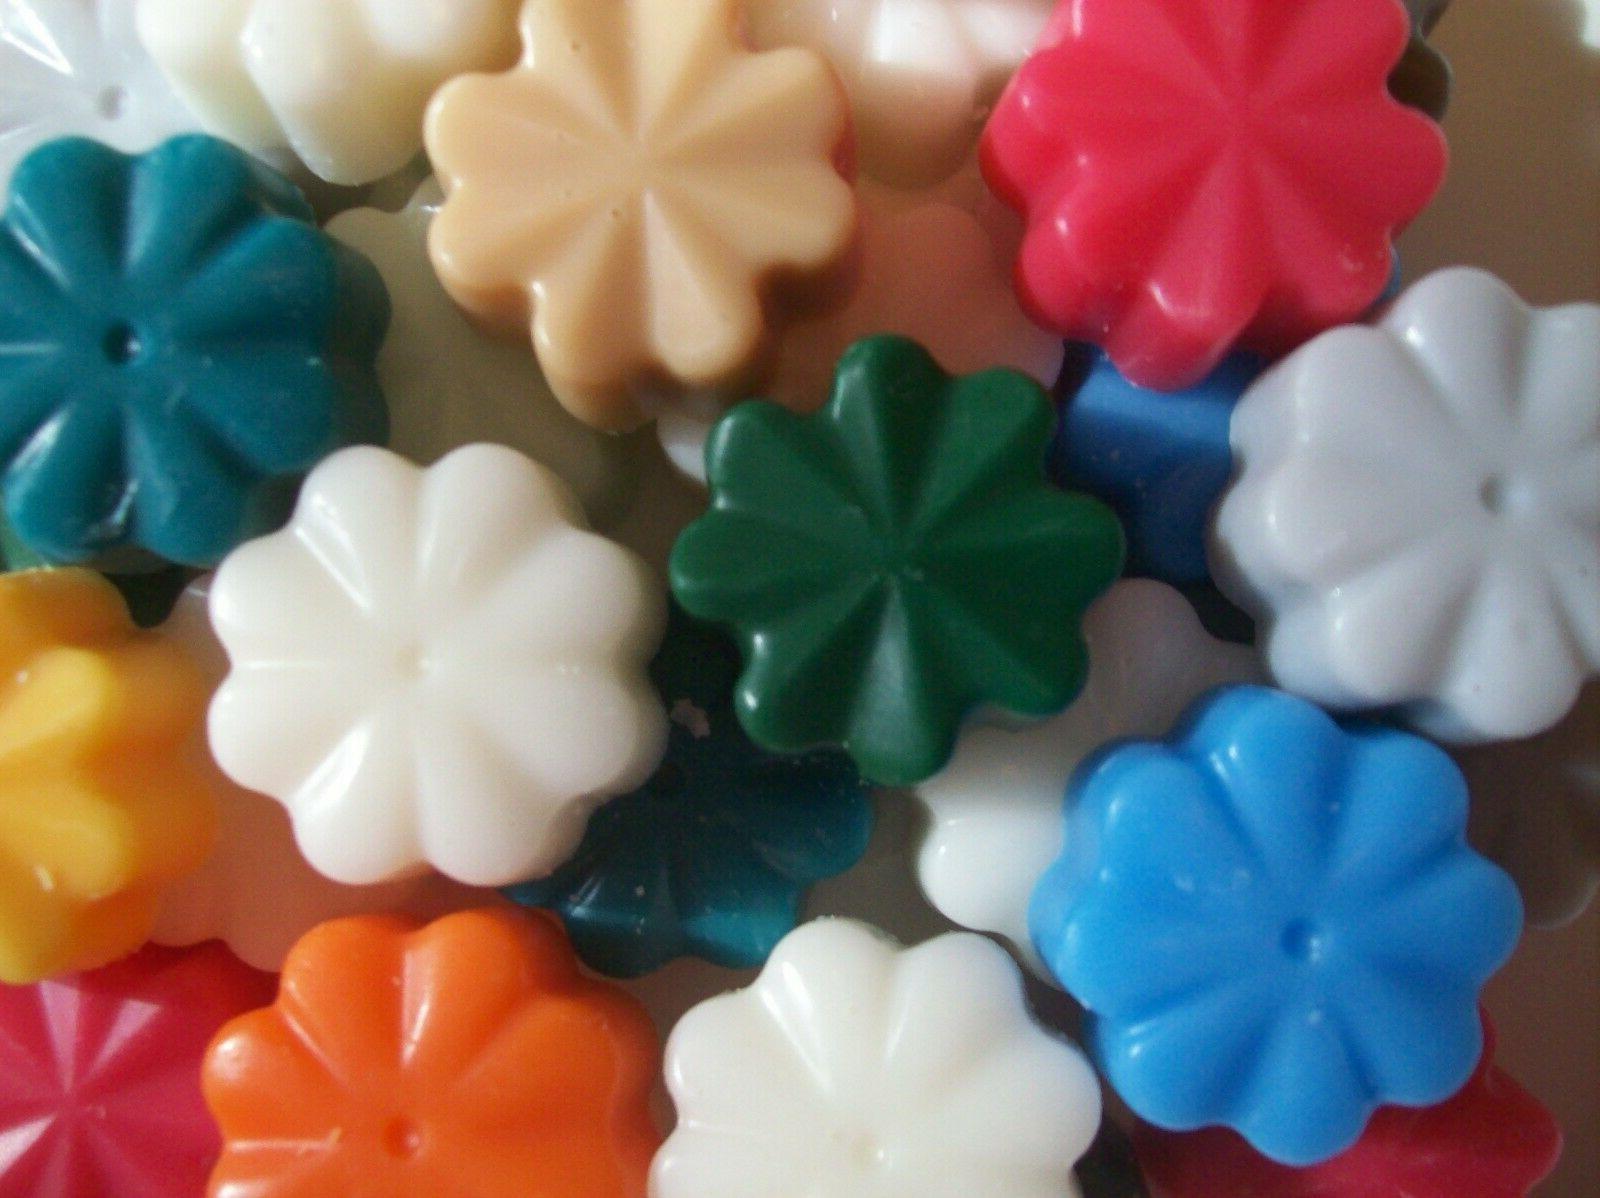 15 wax tarts fragrance melts bath